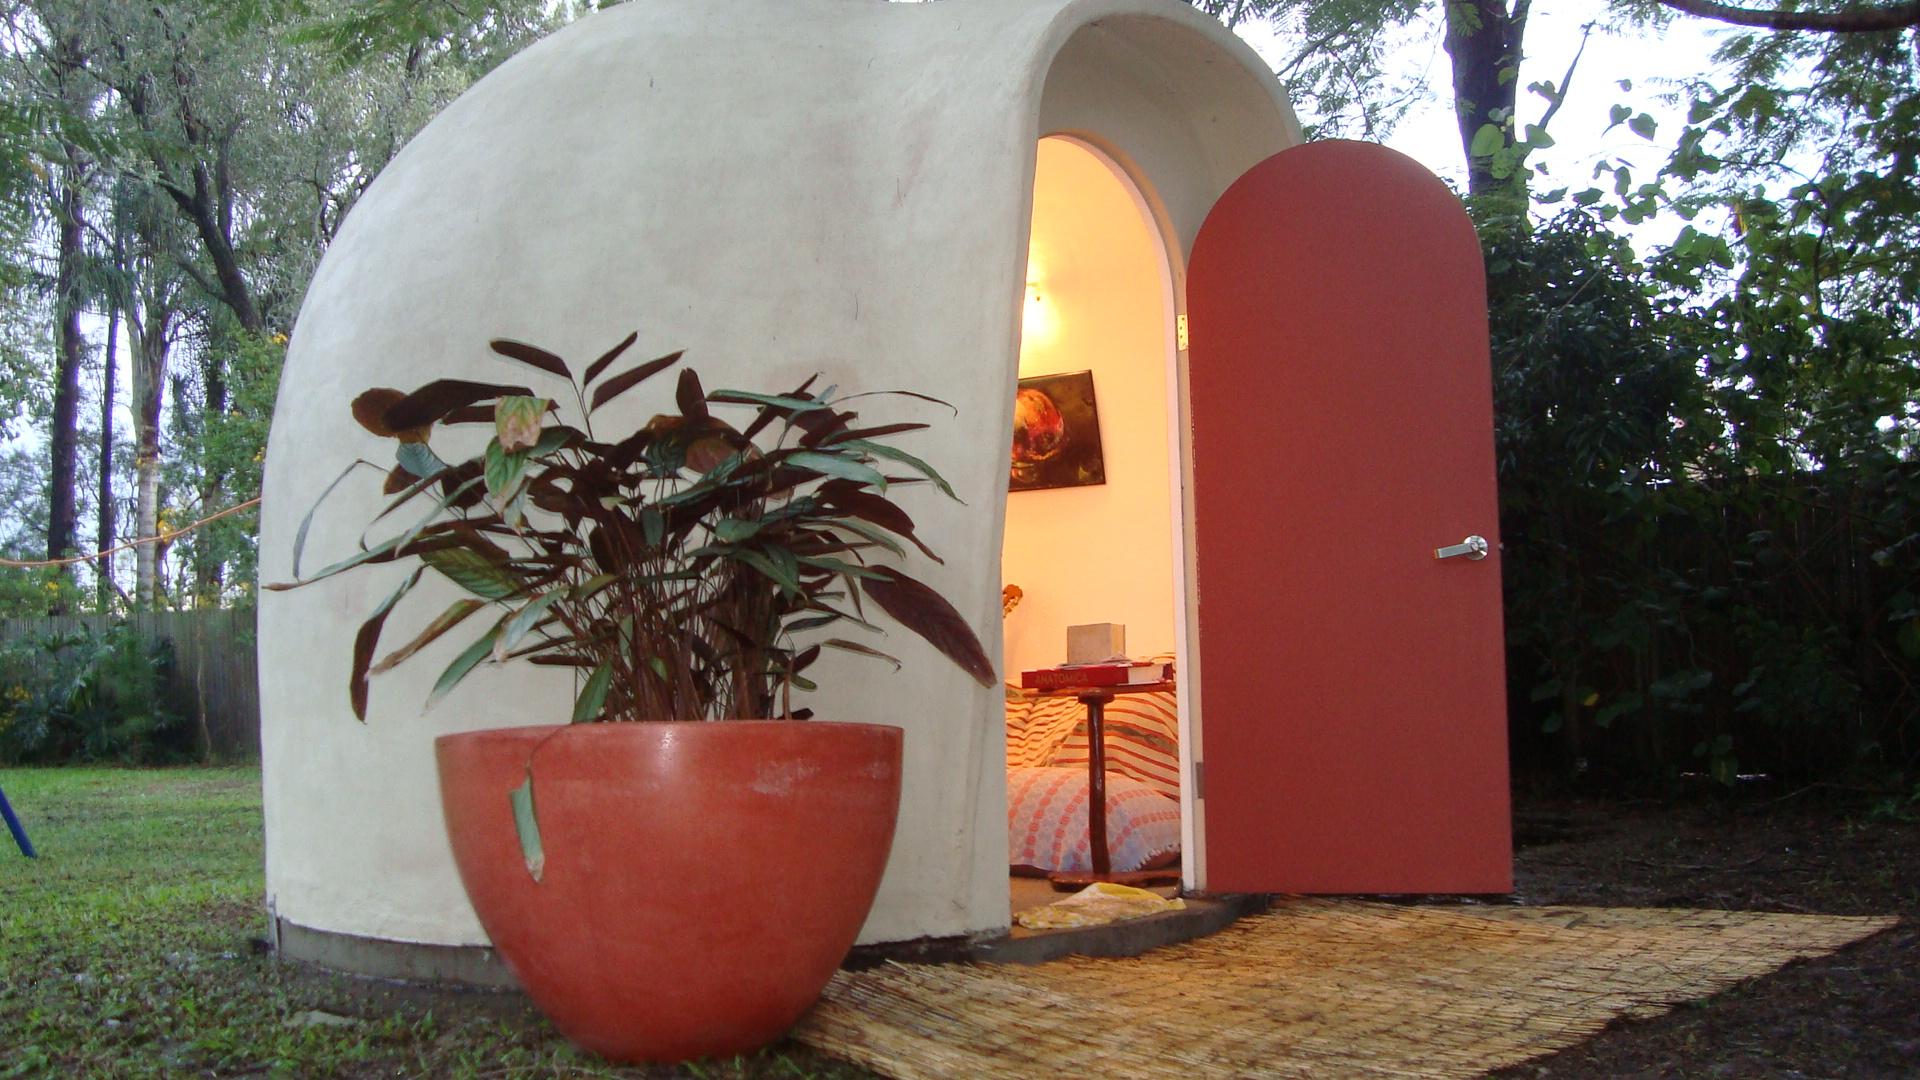 3.0m dia. (7m2) Dome garden room studio